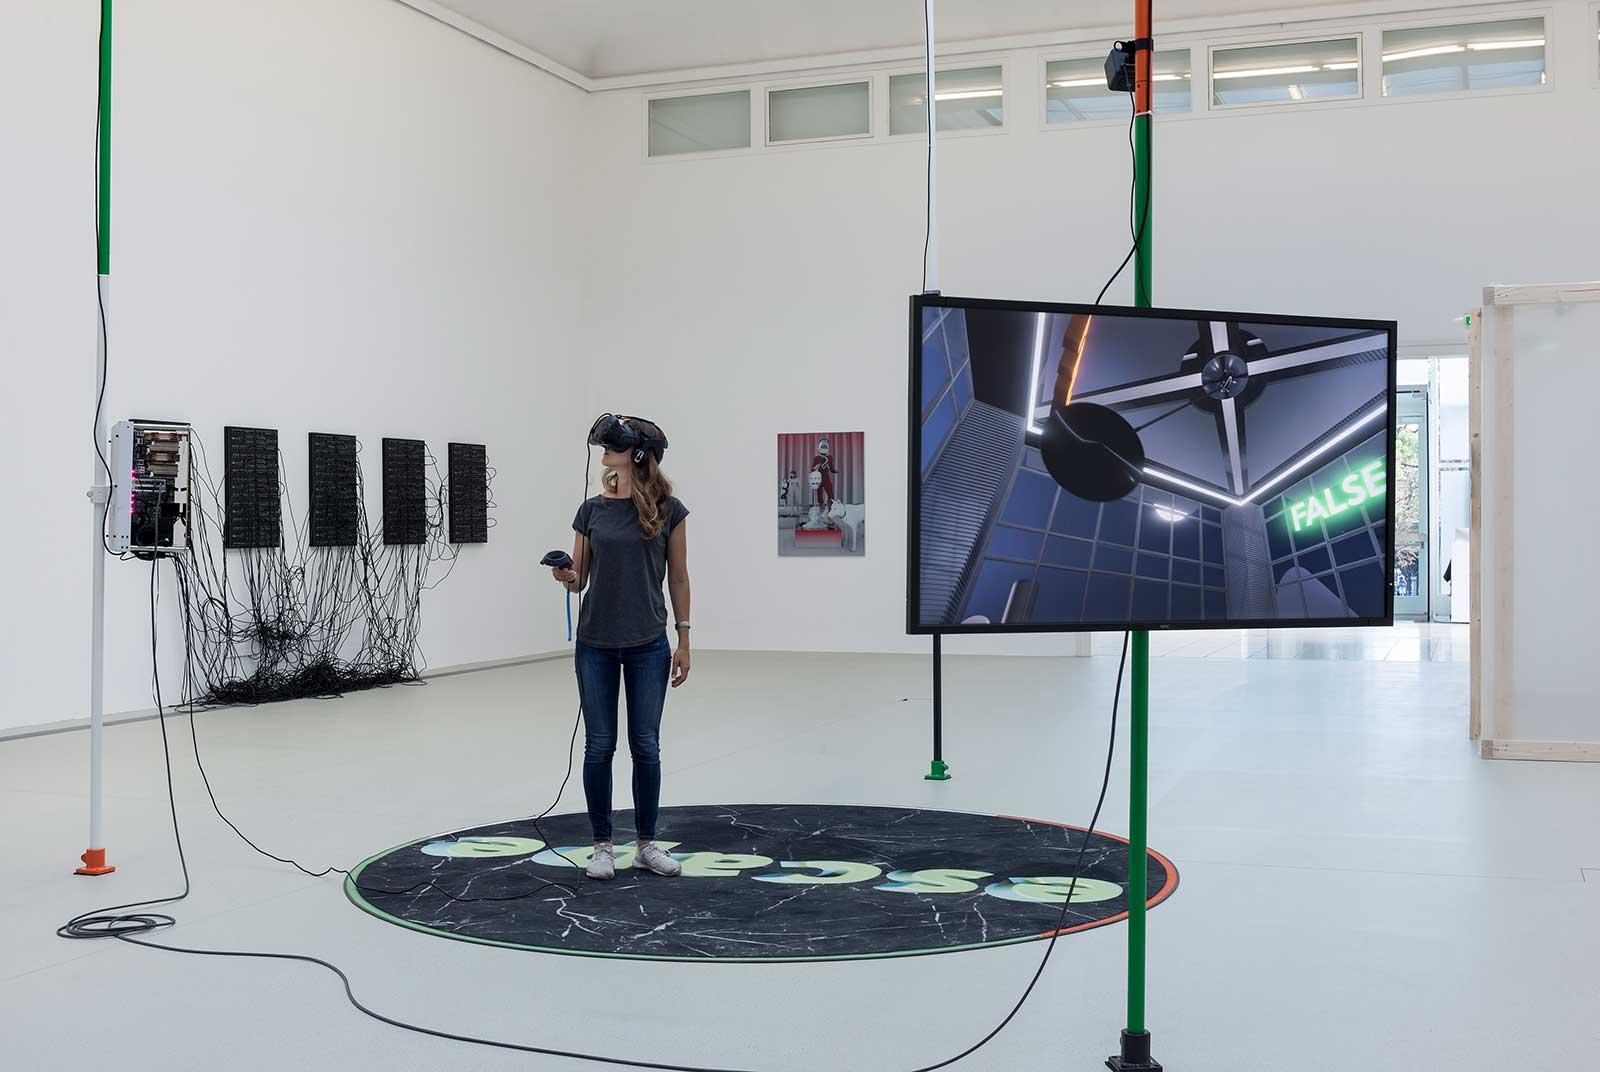 Palo Alto, VR-Installation, KM, 2018